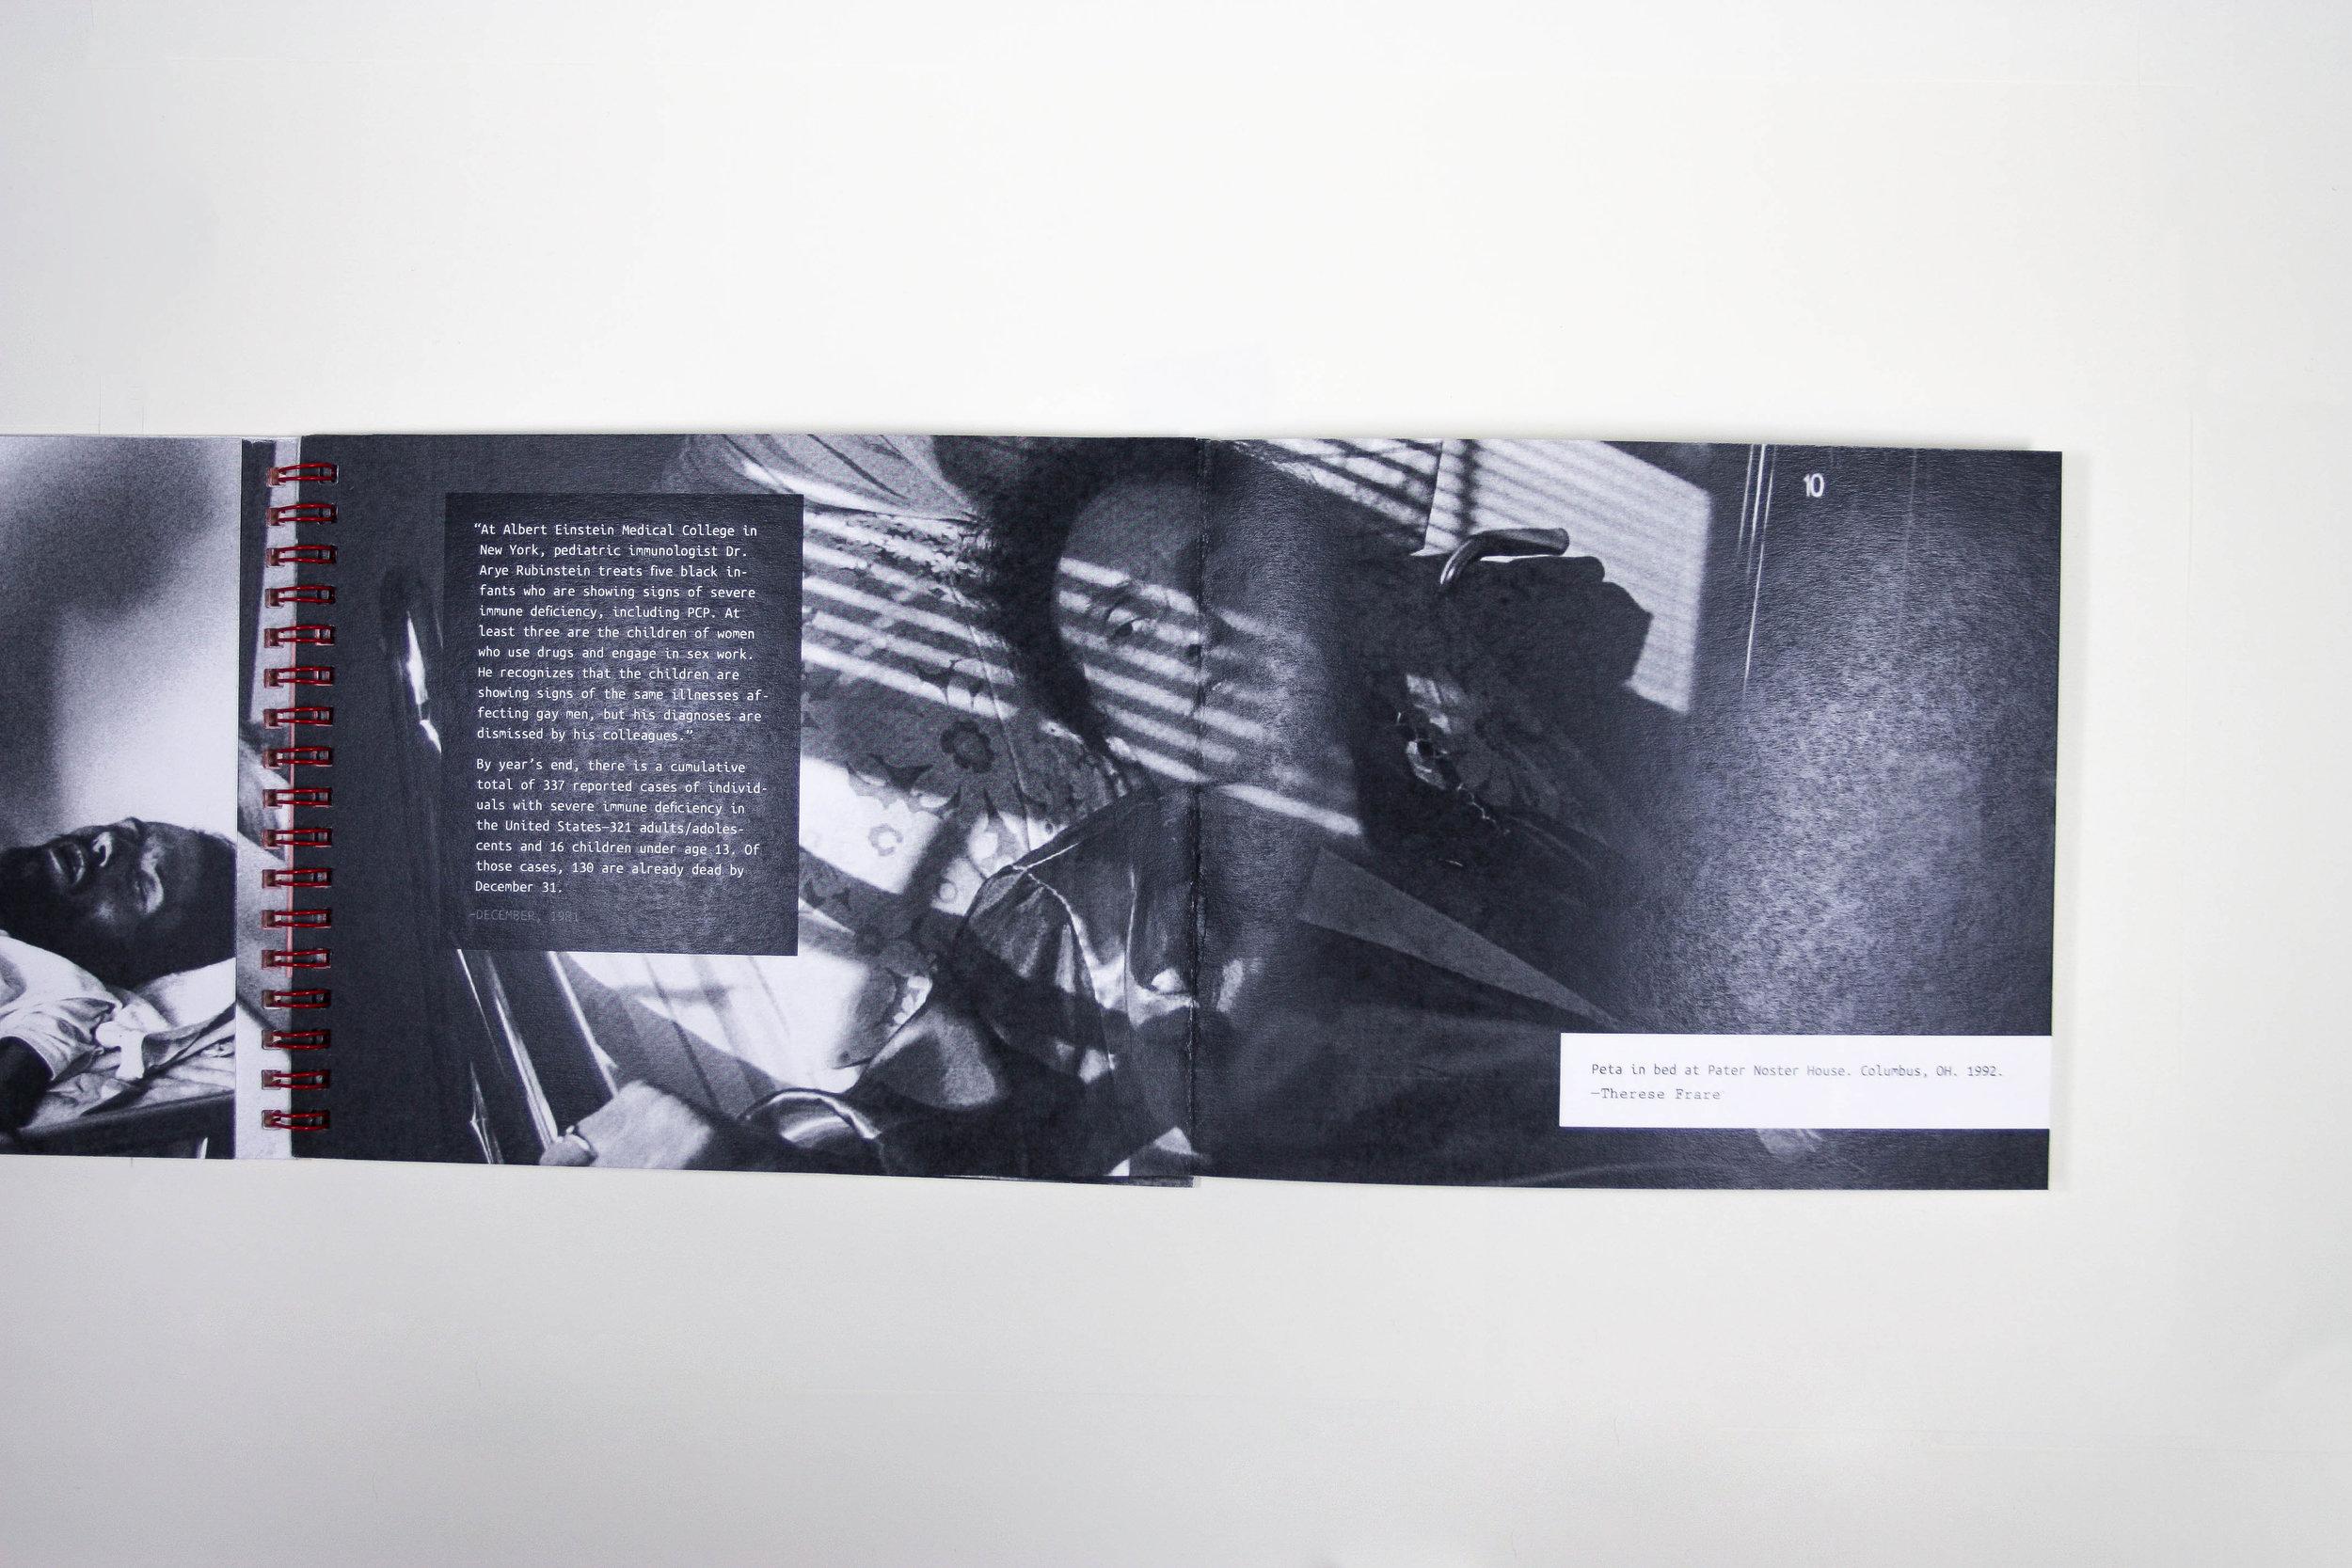 estory-bookimages-7.jpg